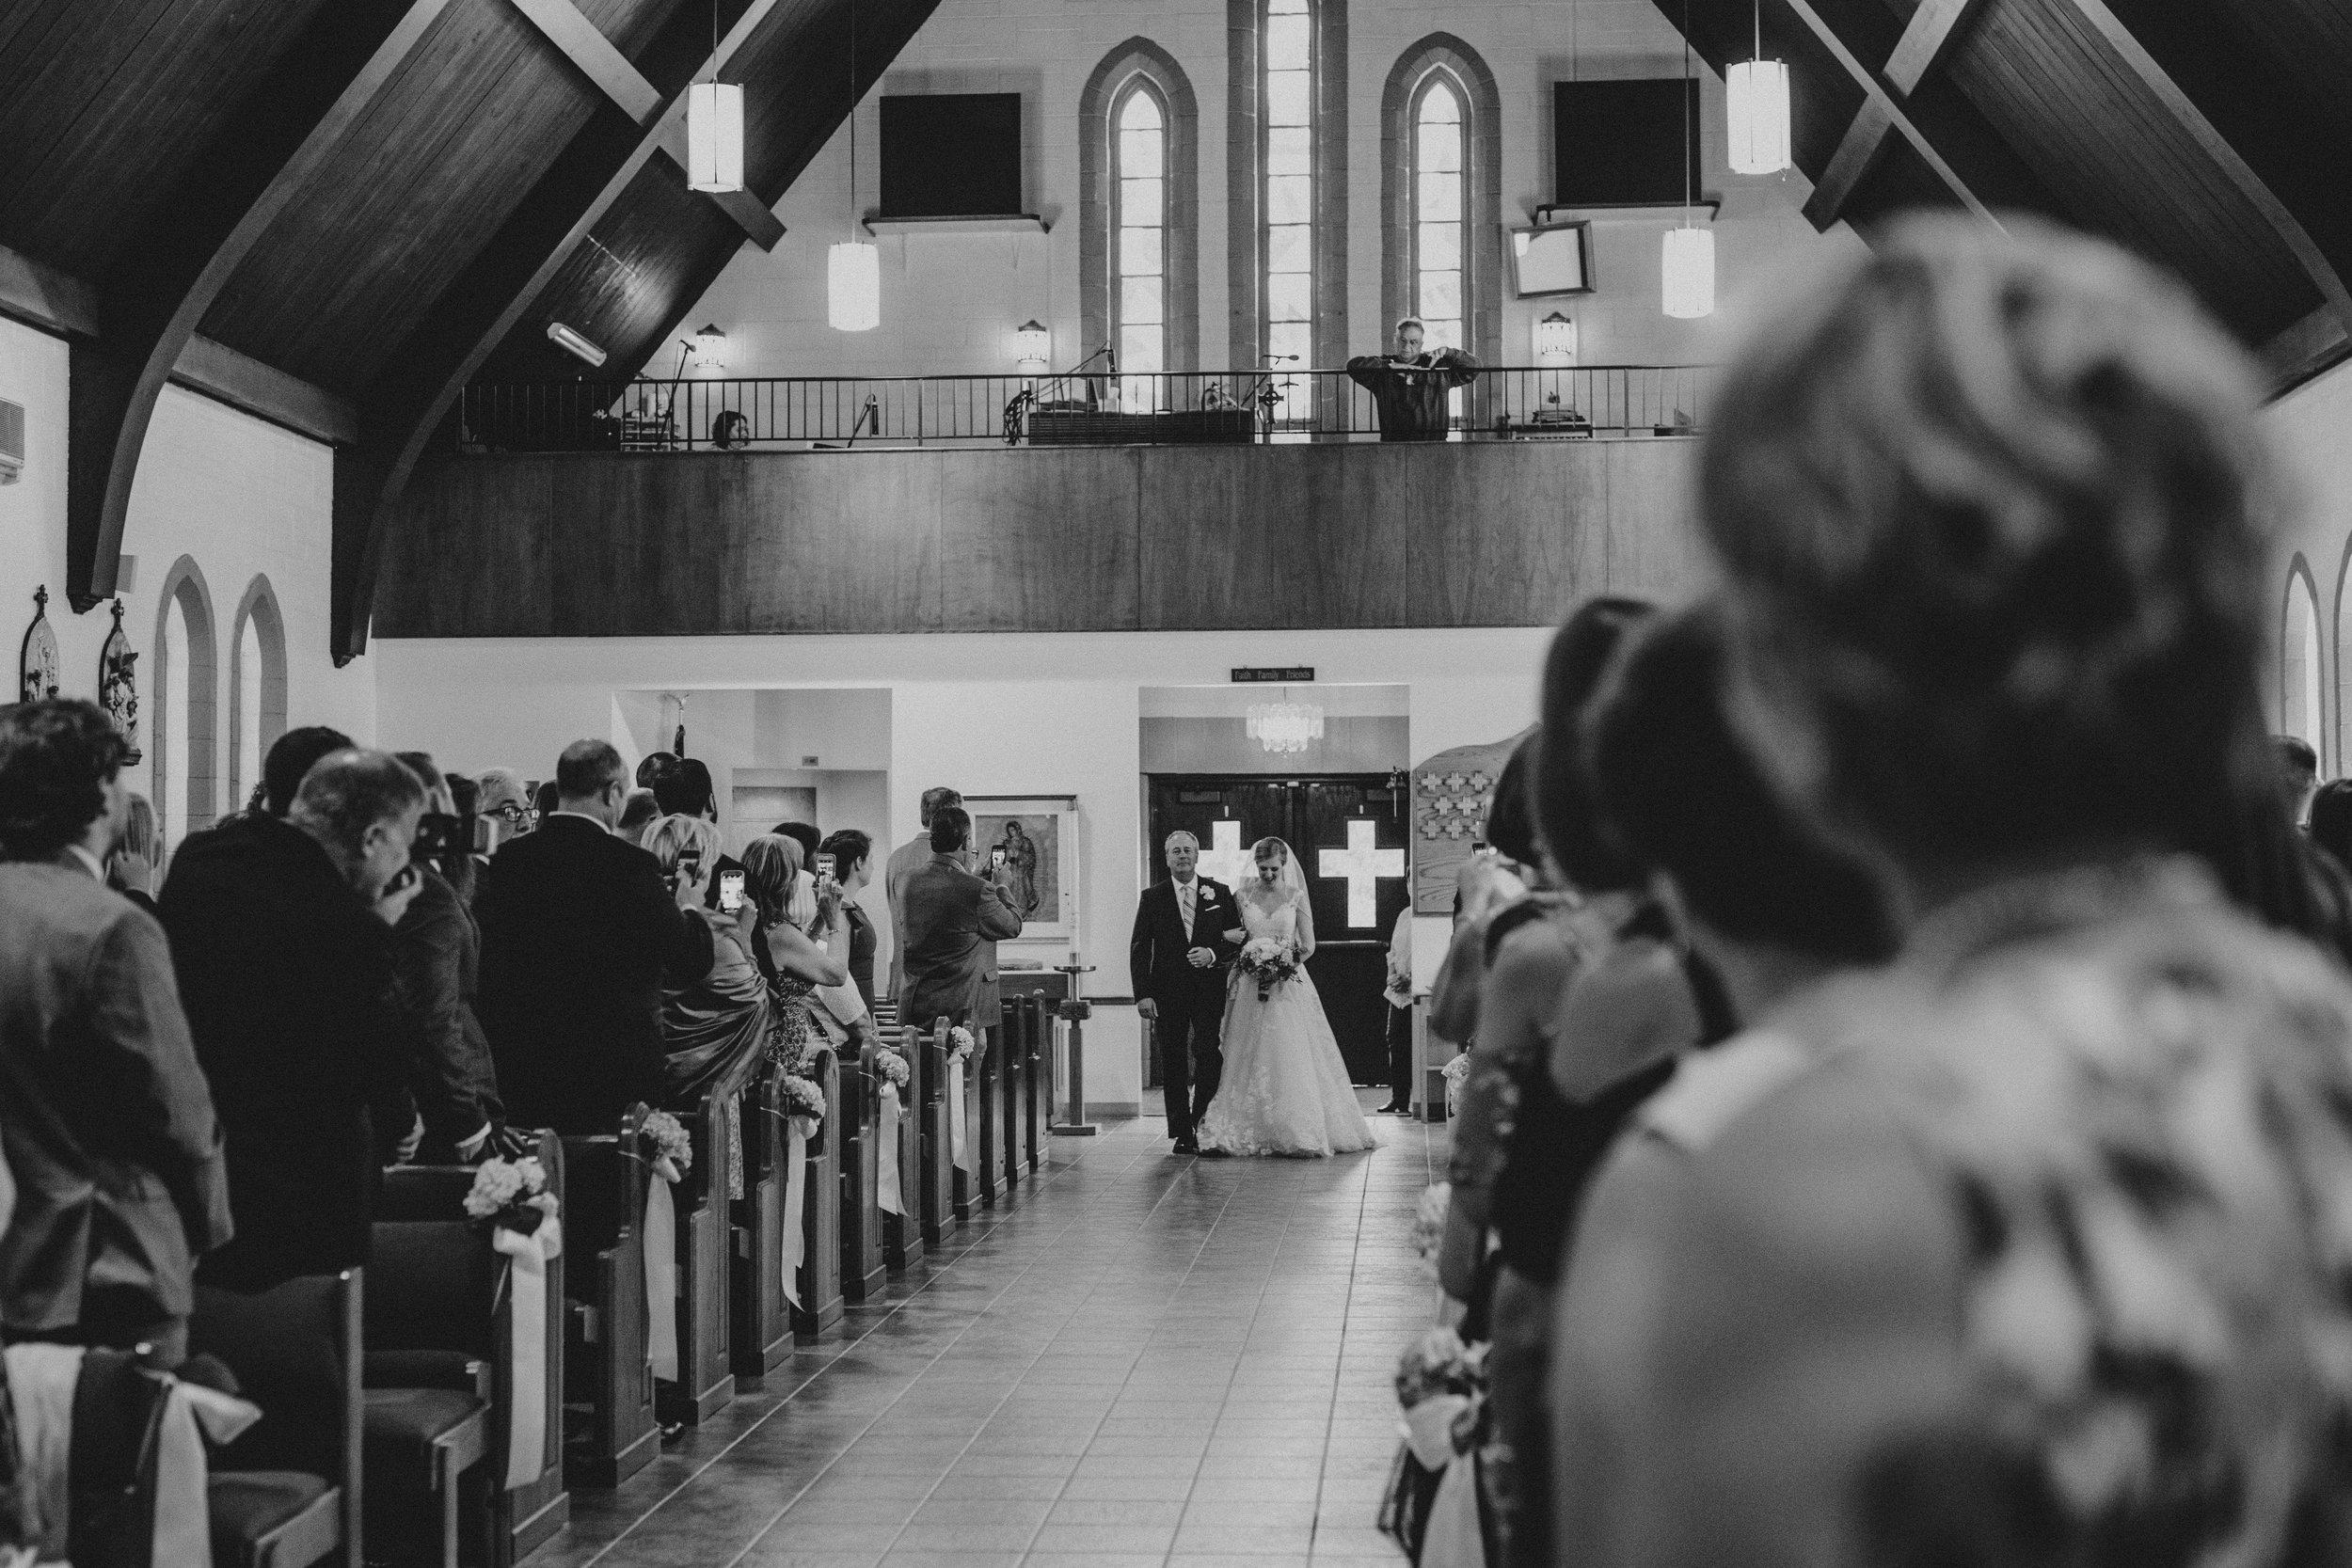 shaker_heritage_wedding_0023.JPG